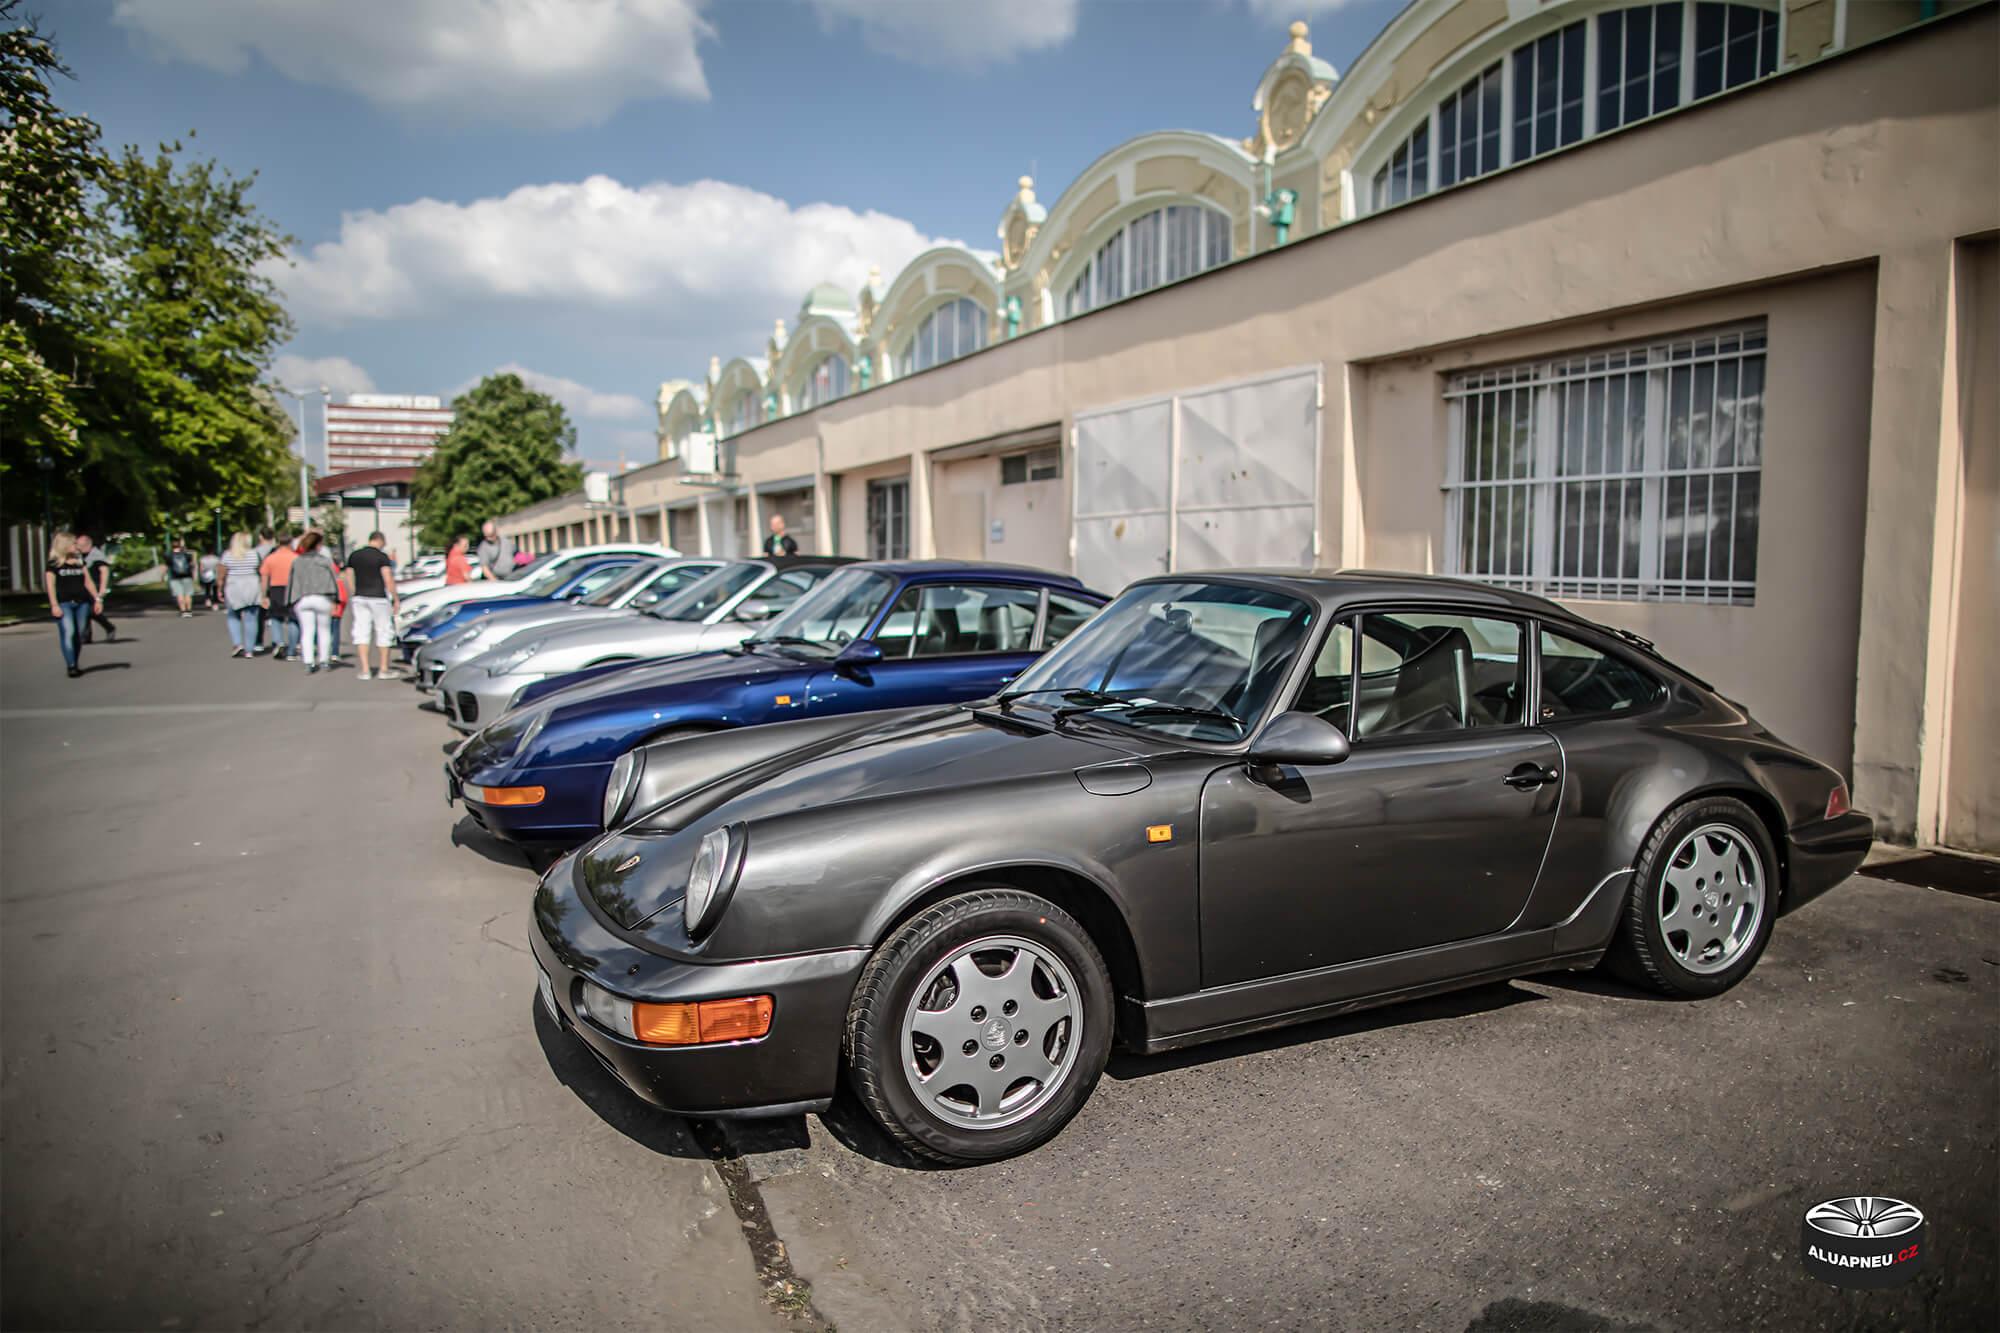 Originální elektrony Porsche - Youngtimer - www.aluapneu.cz